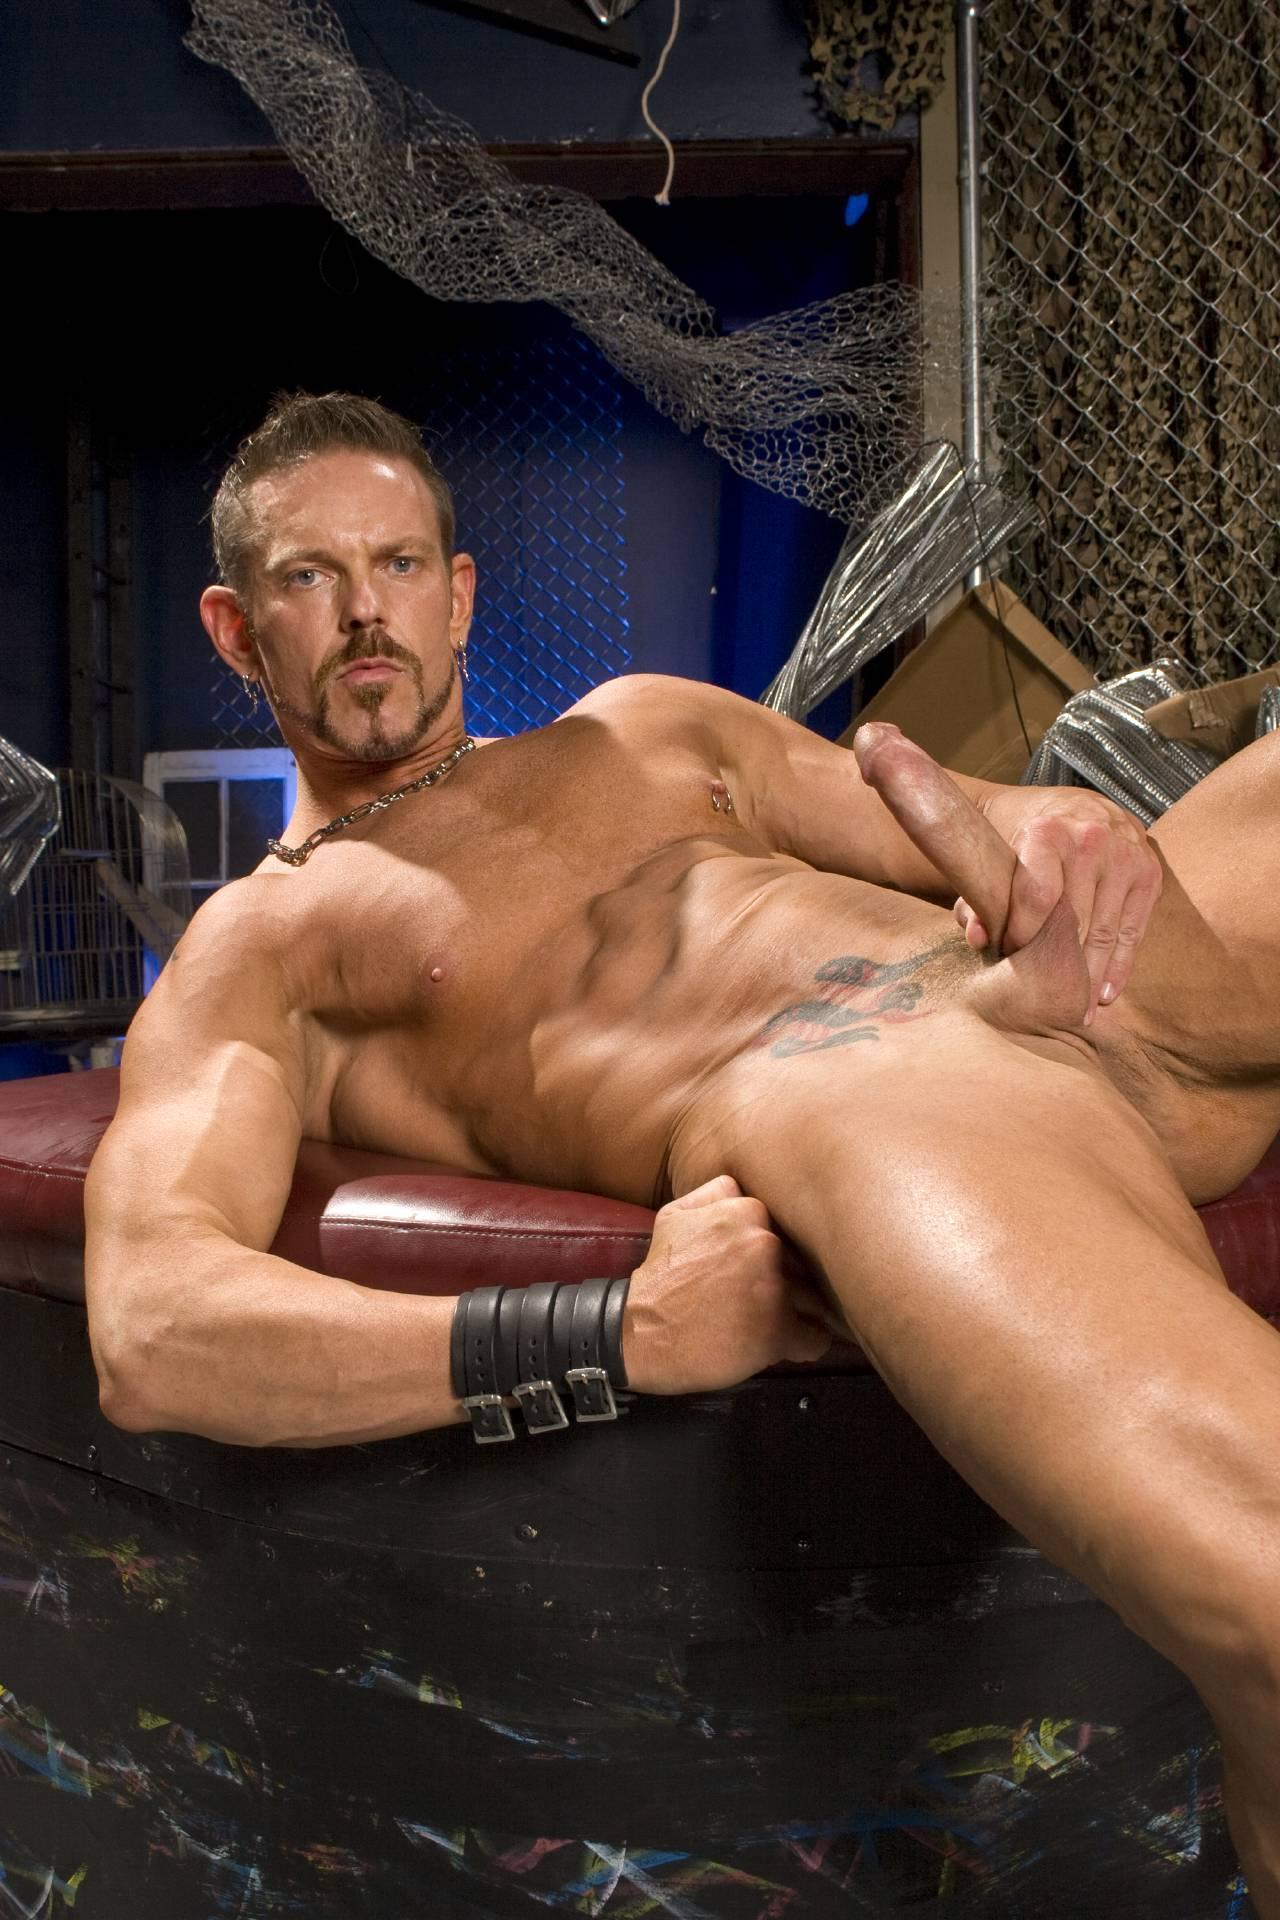 Colin steele naked